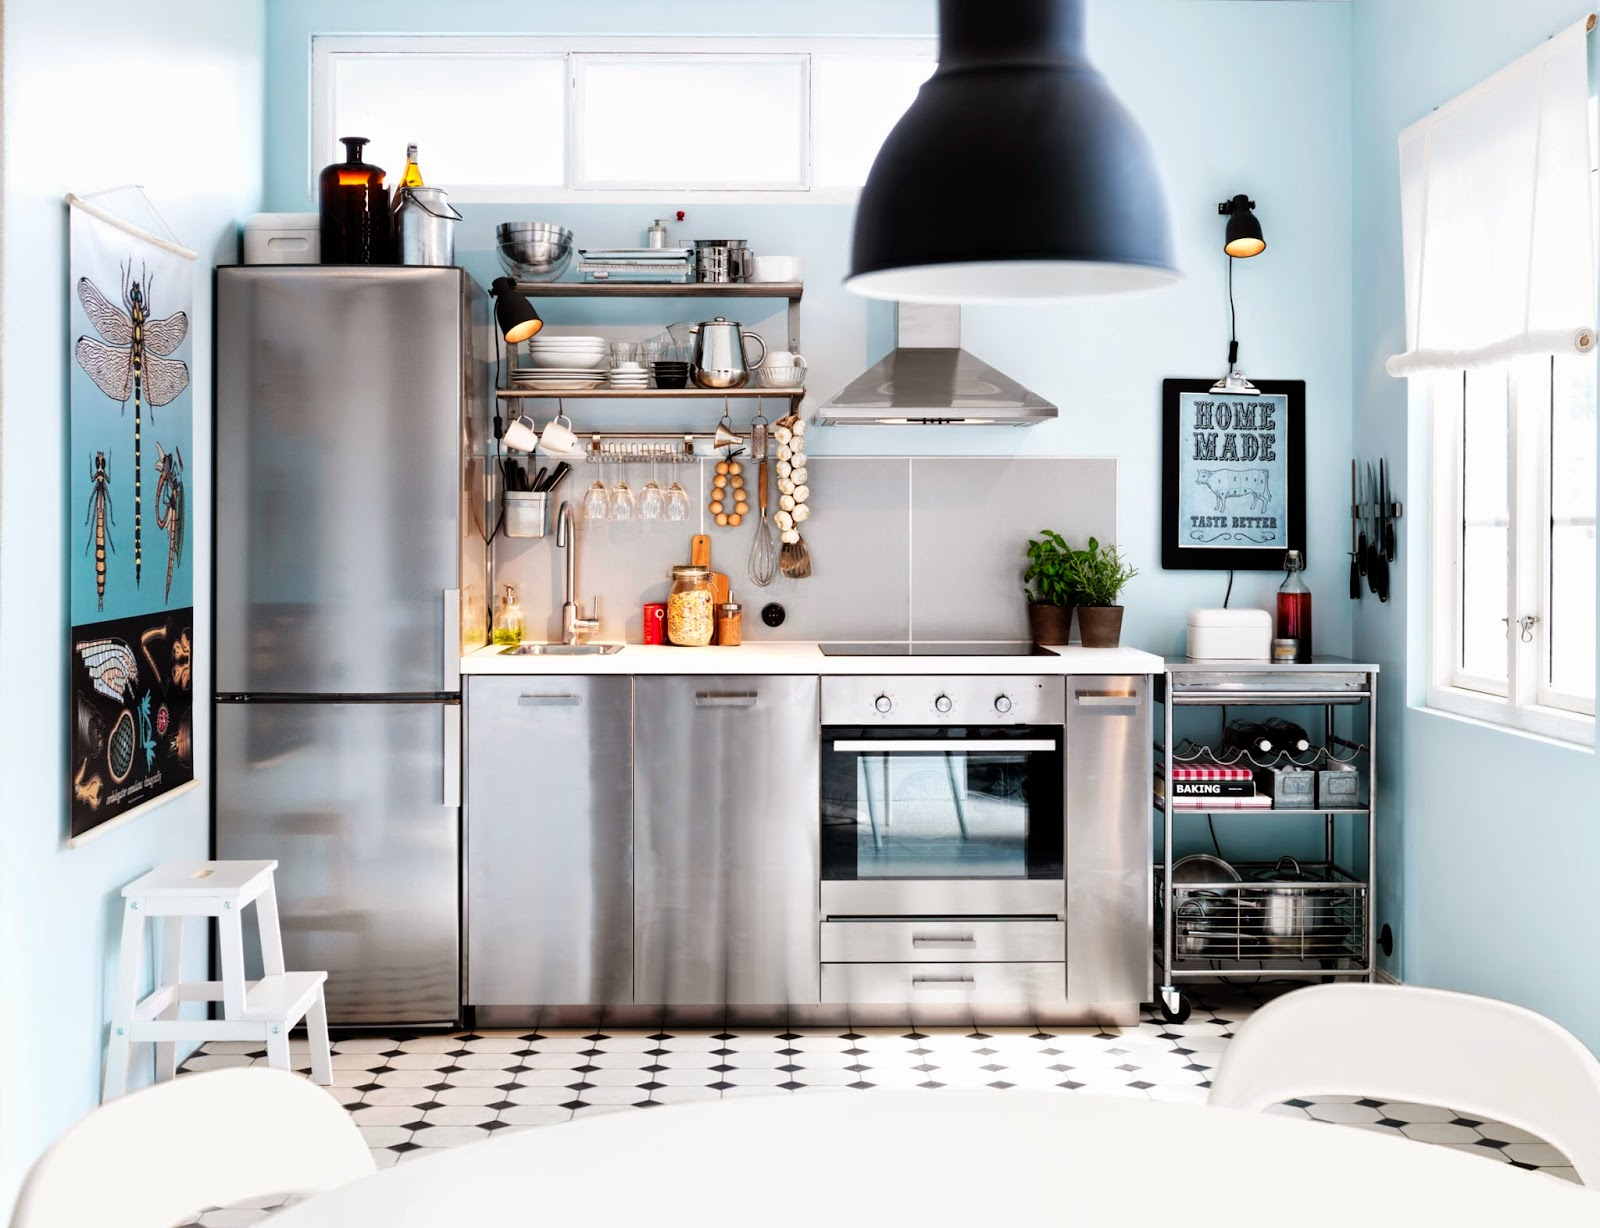 Awesome Ikea Accessori Per Cucina Photos - Ideas & Design 2017 ...